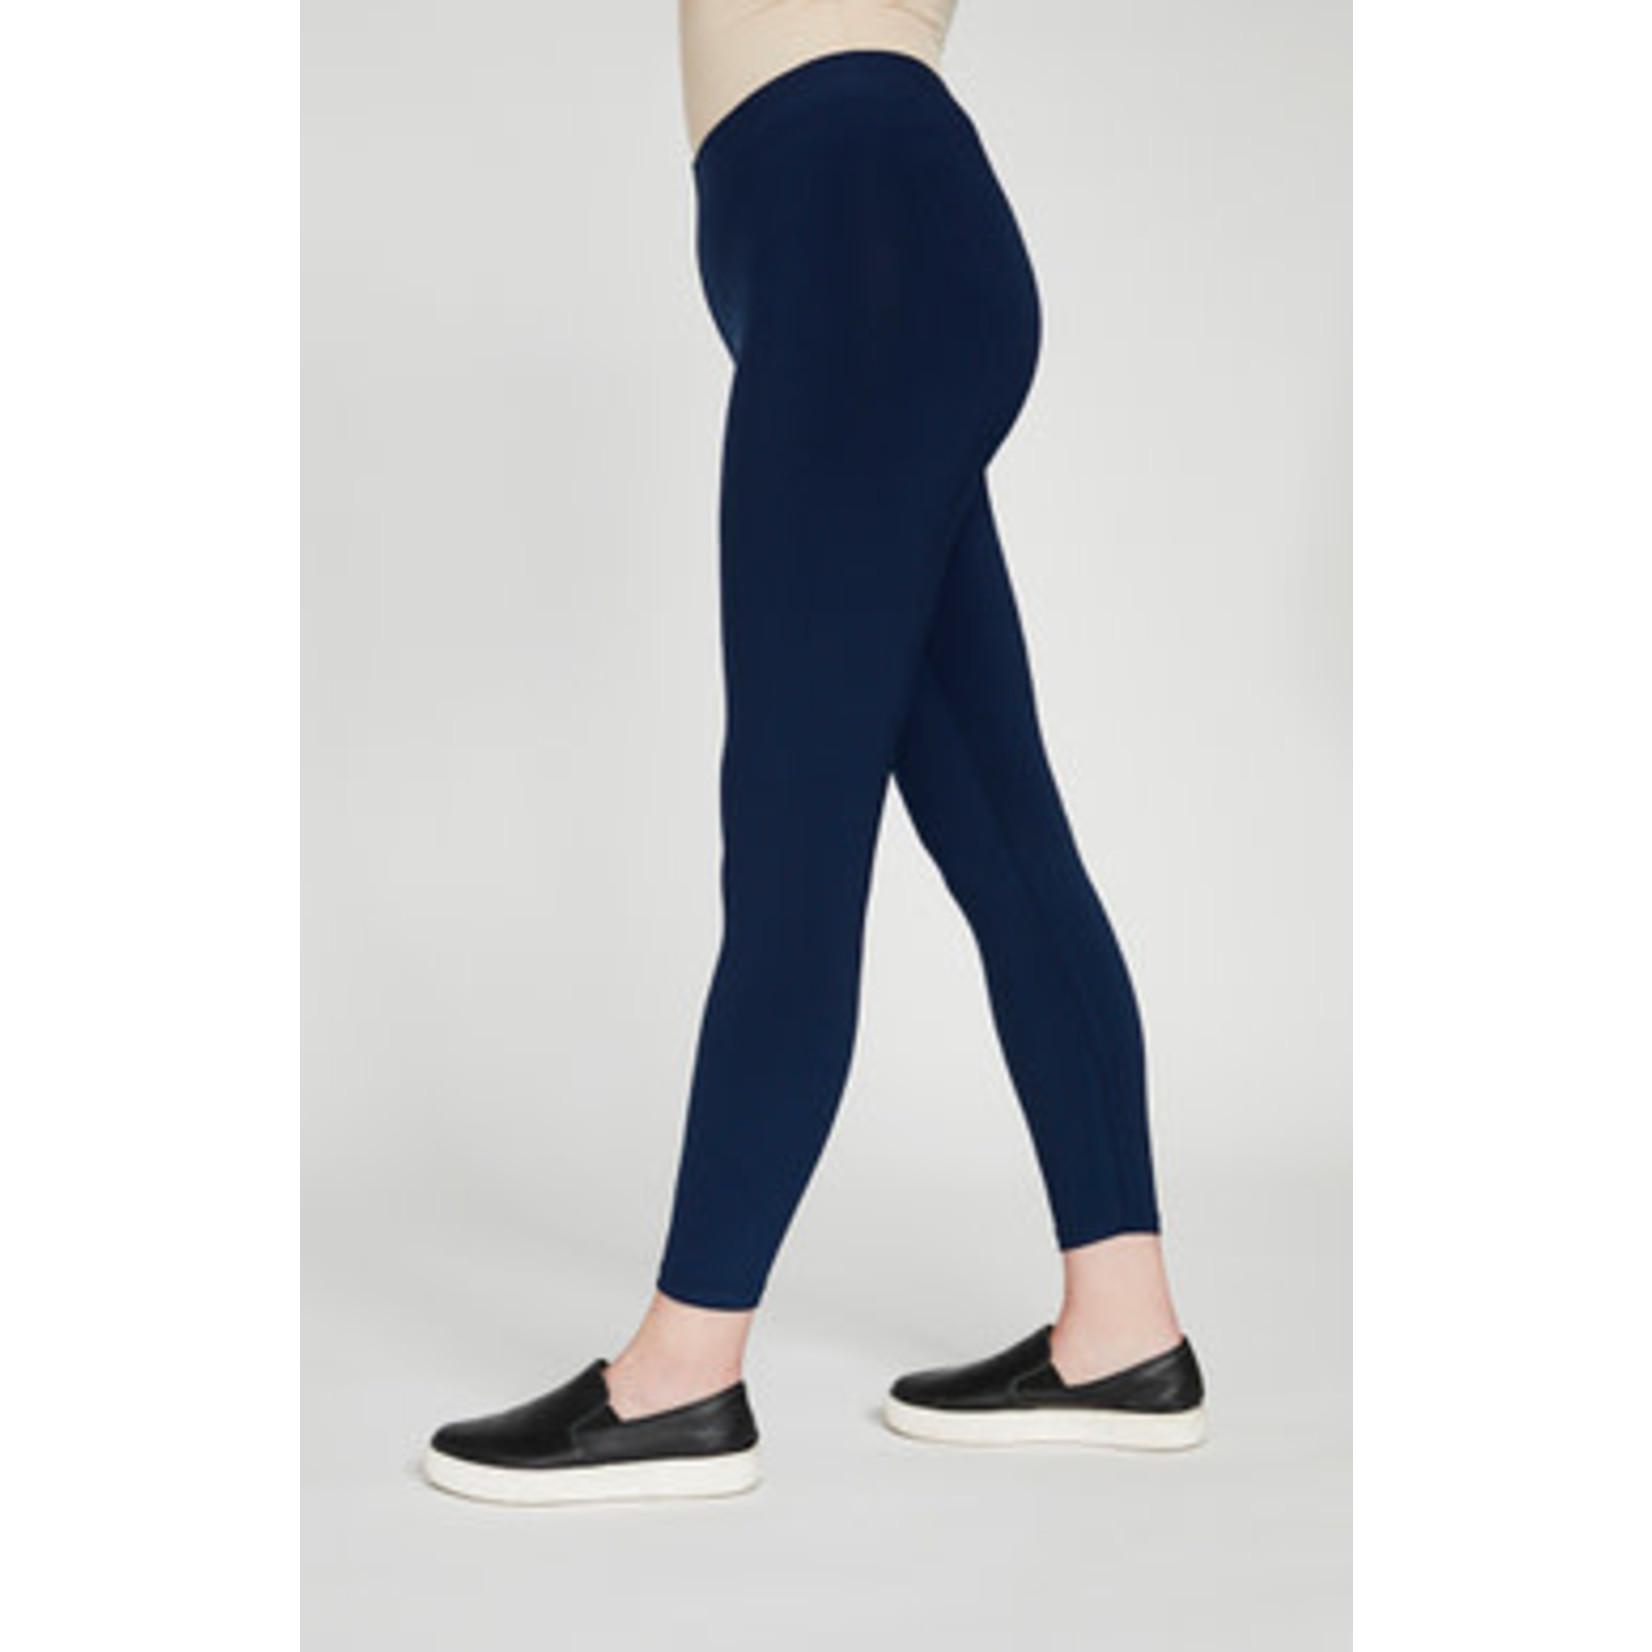 Sympli Sympli Basic Legging